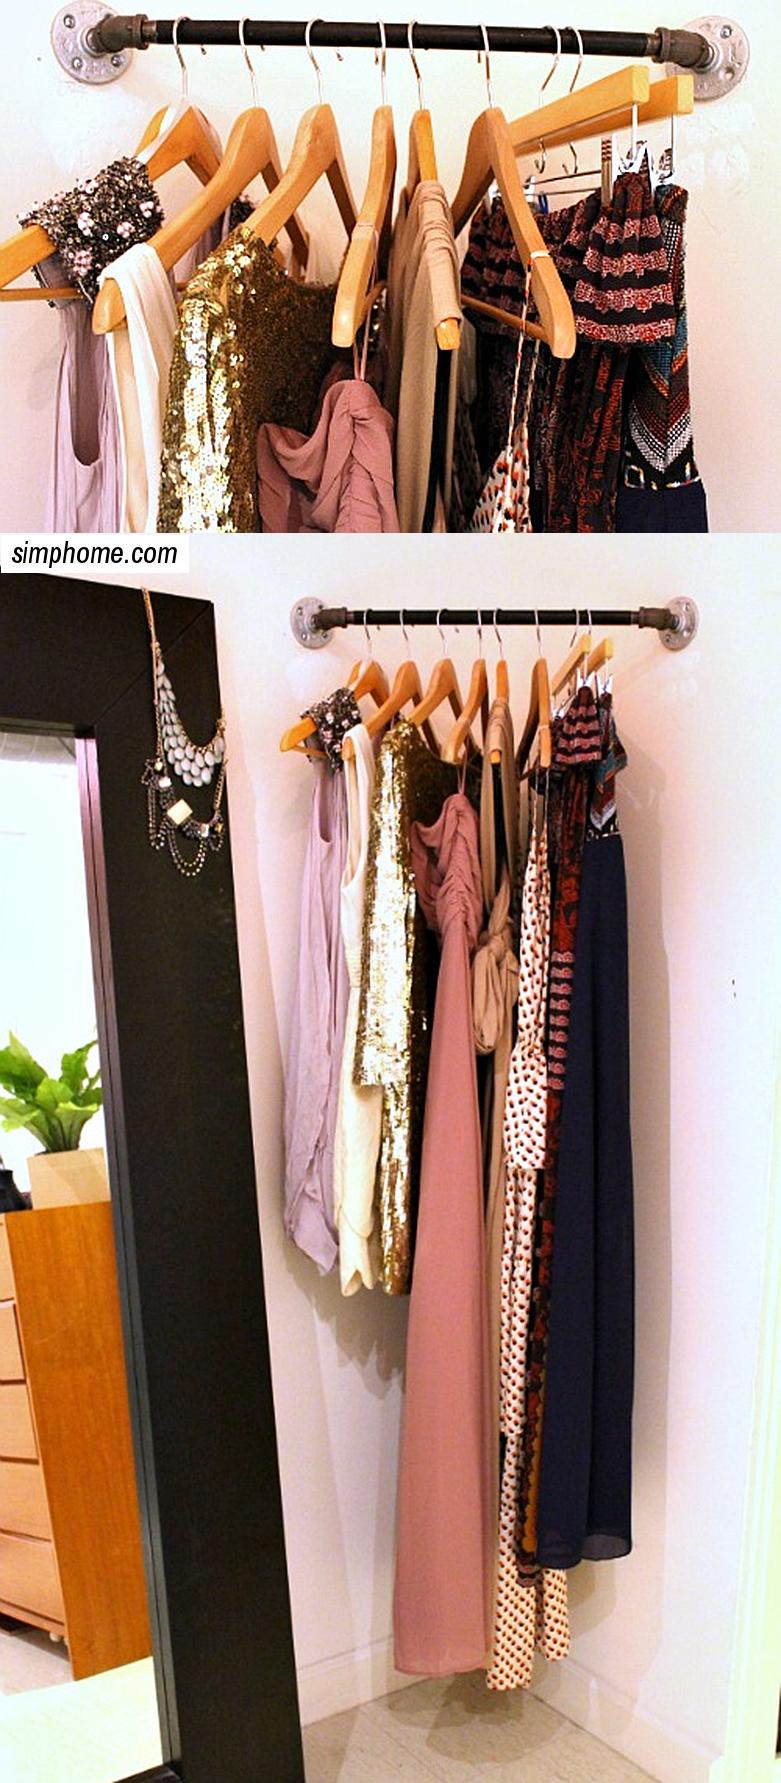 DIY Industrial dress bar via simphome 3